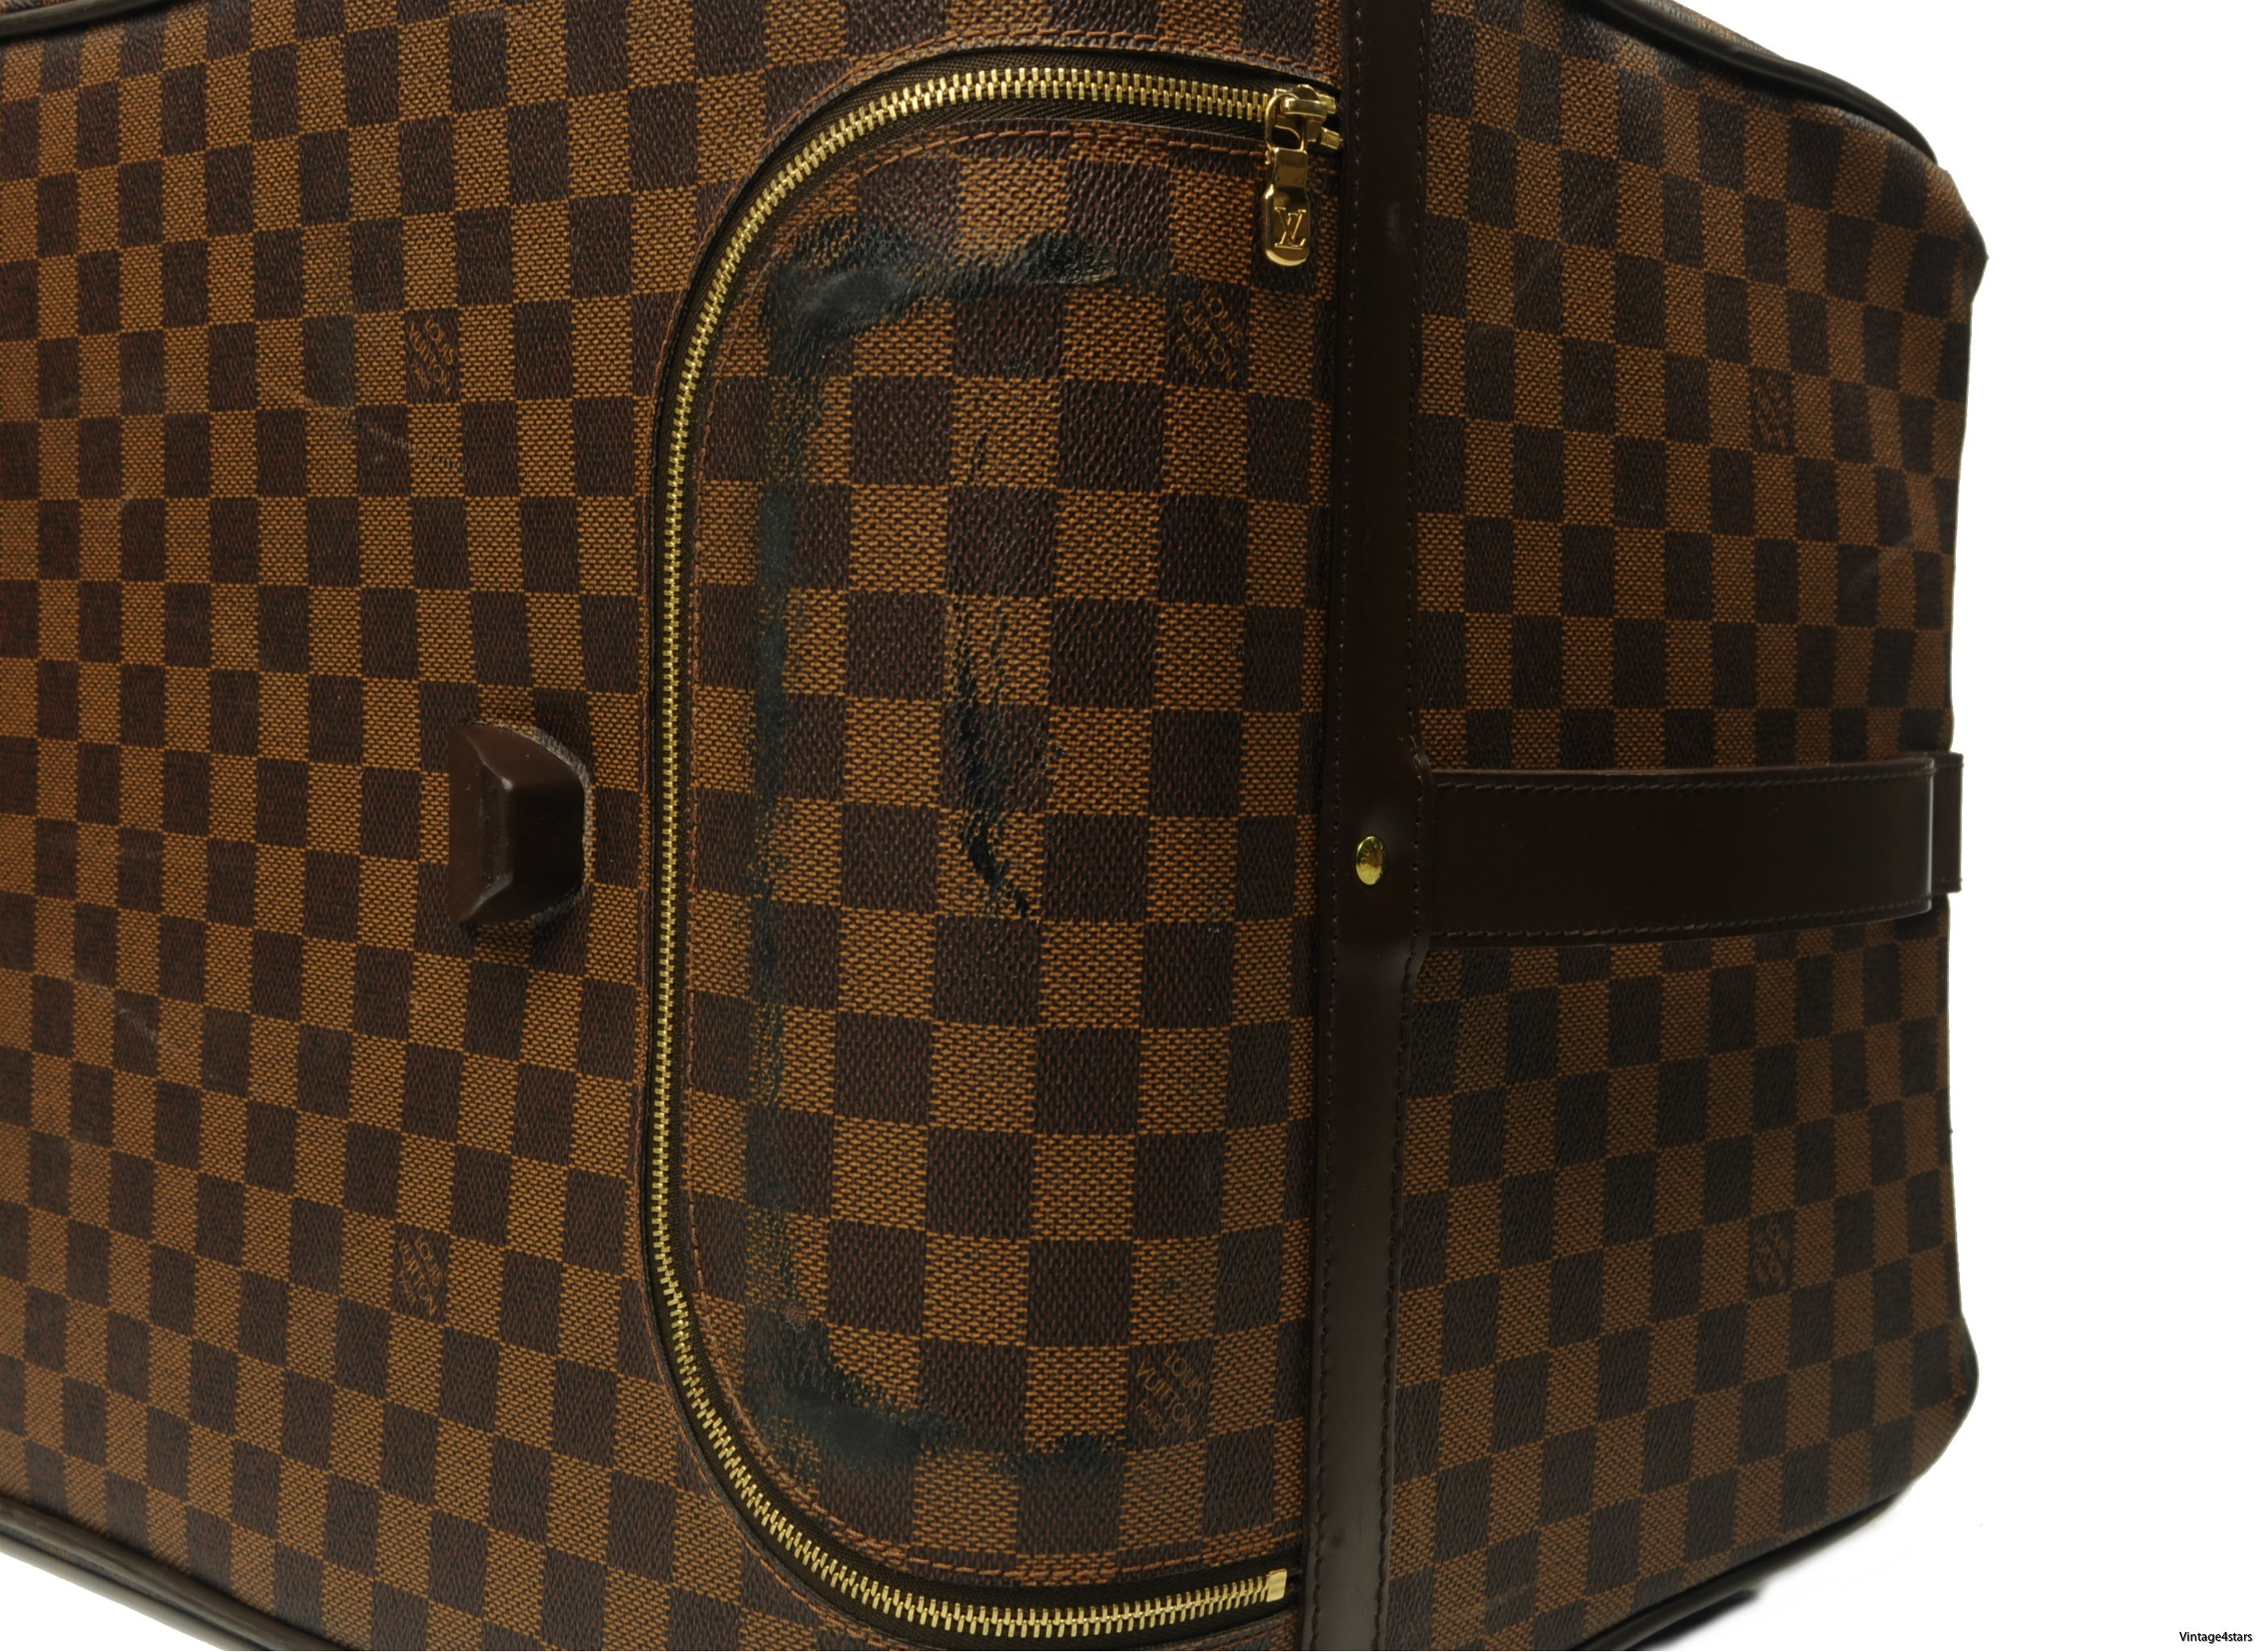 Louis Vuitton Eole 60 Damier Ebene 15